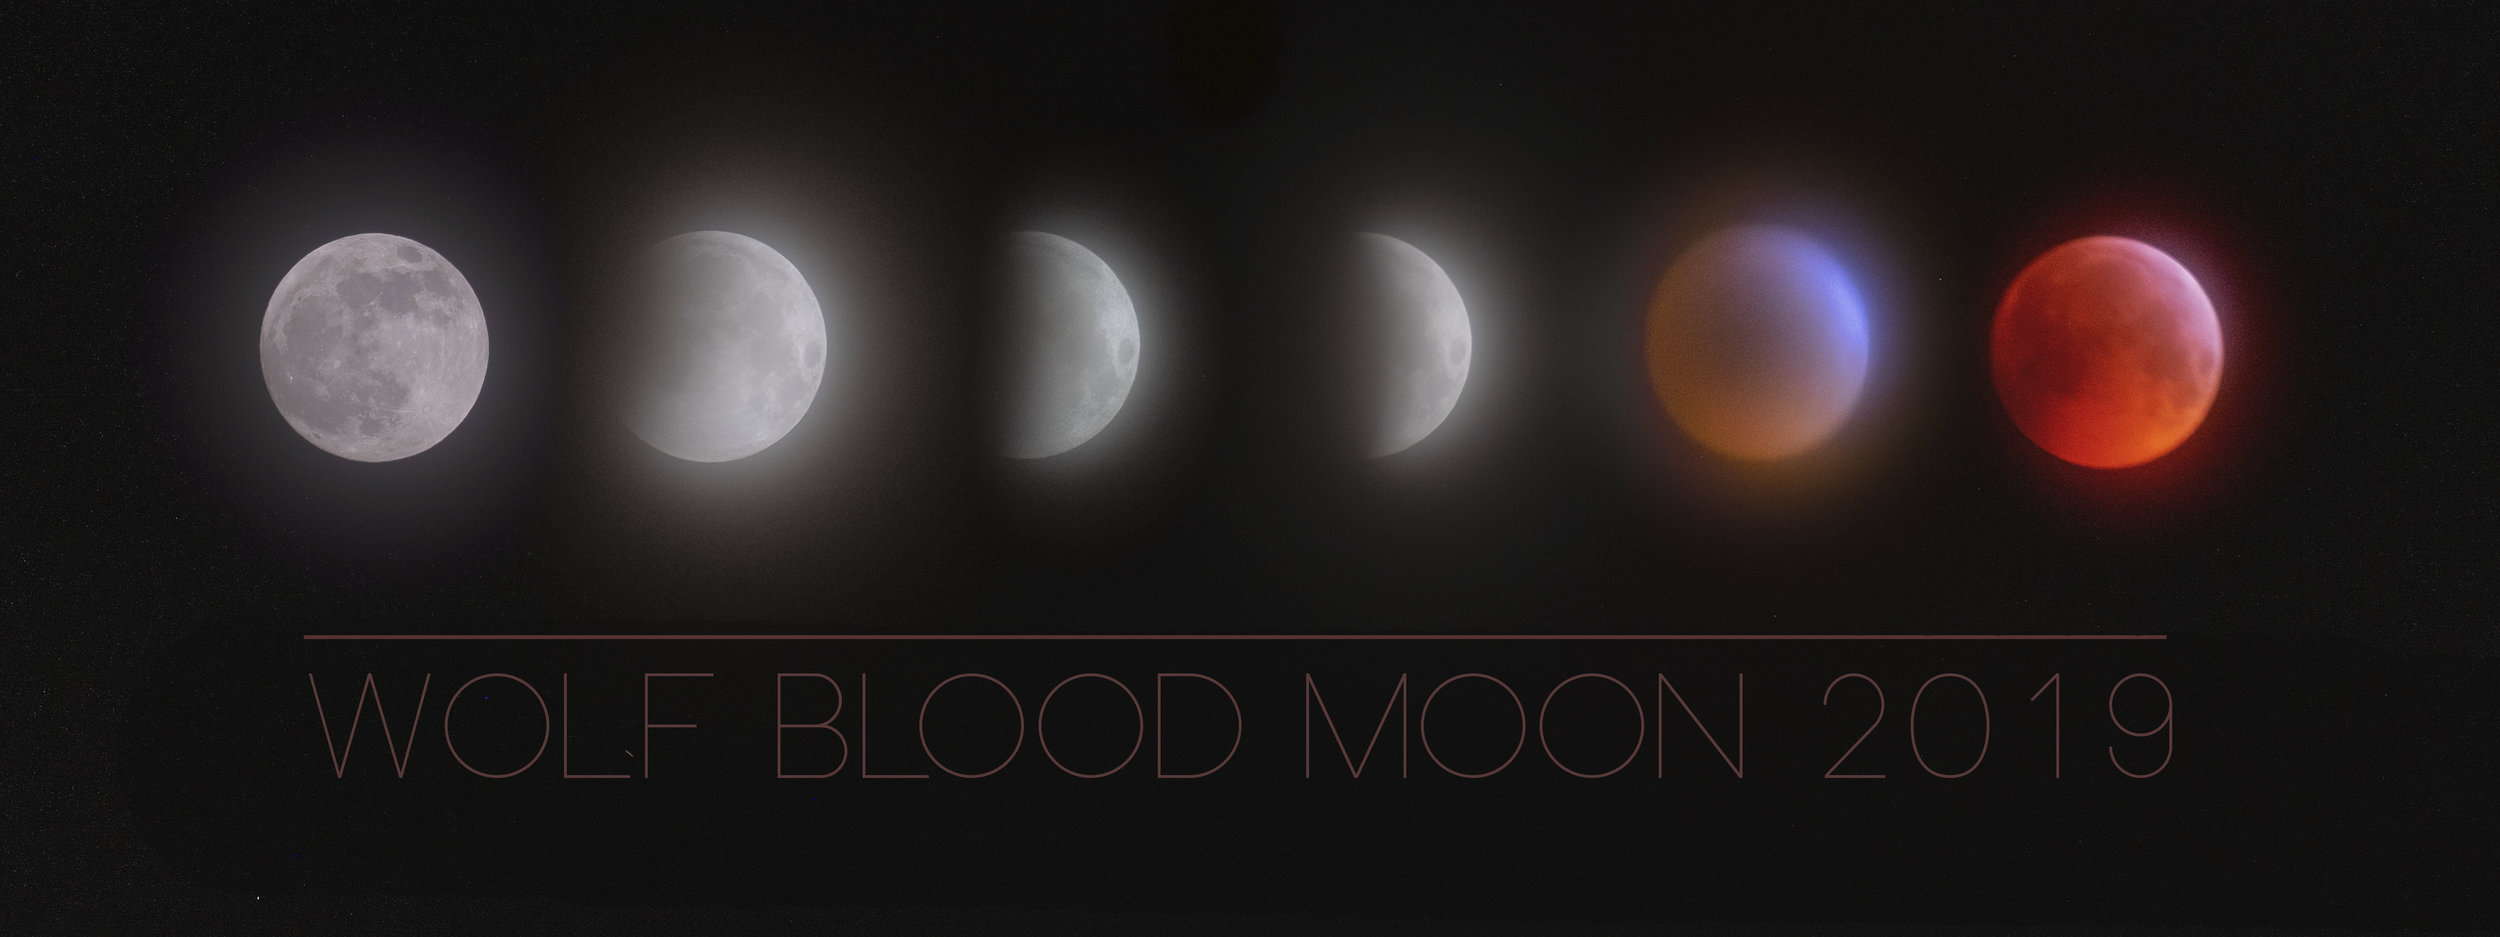 Wolf Blood Moon montage.jpg